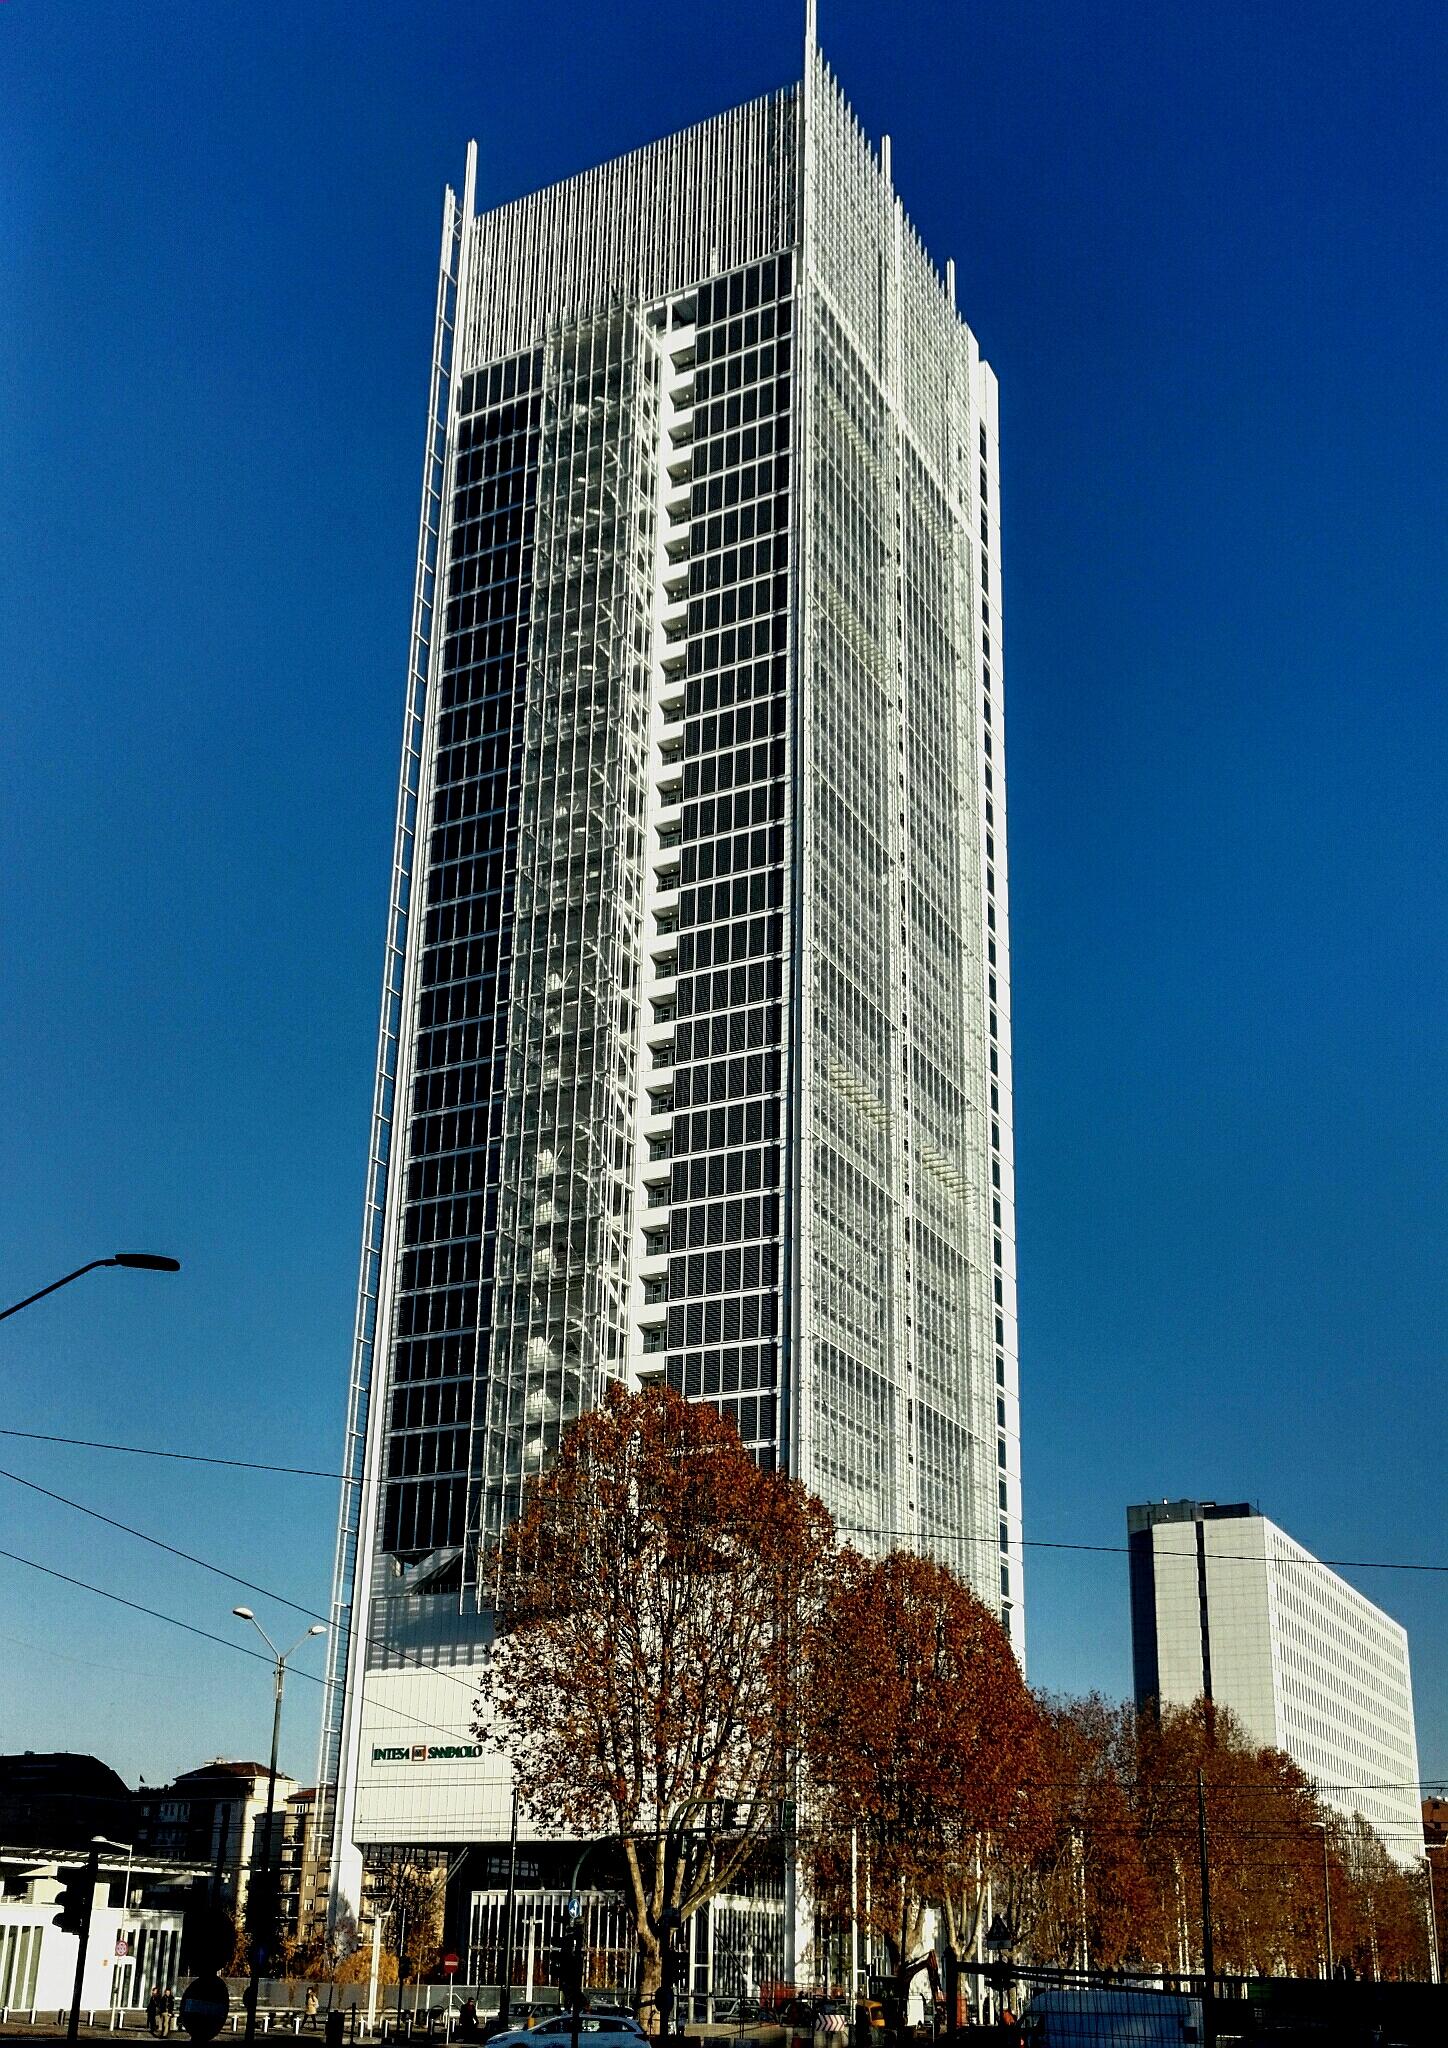 Grattacielo_Intesa_San_Paolo_-_Torino.jpg